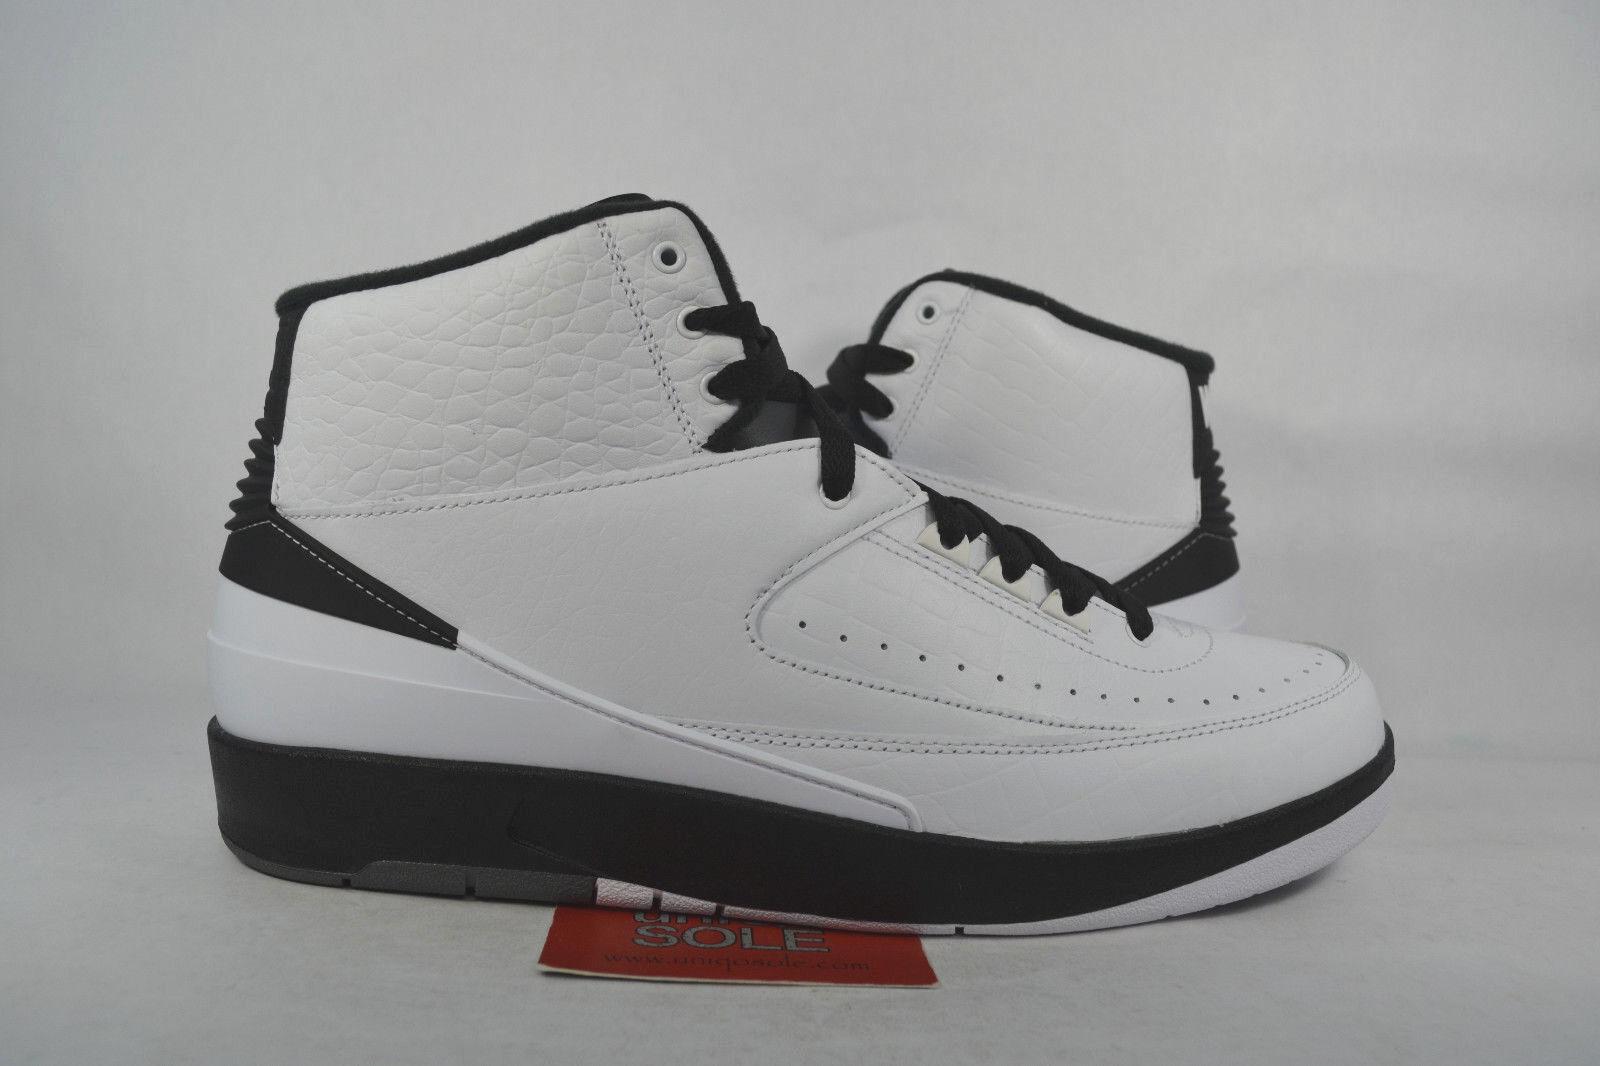 Nike air jordan ii 2 retro - - - flügel das schwarz - weiße 834272-103 sz 10,5 ds new in box 48ac8c